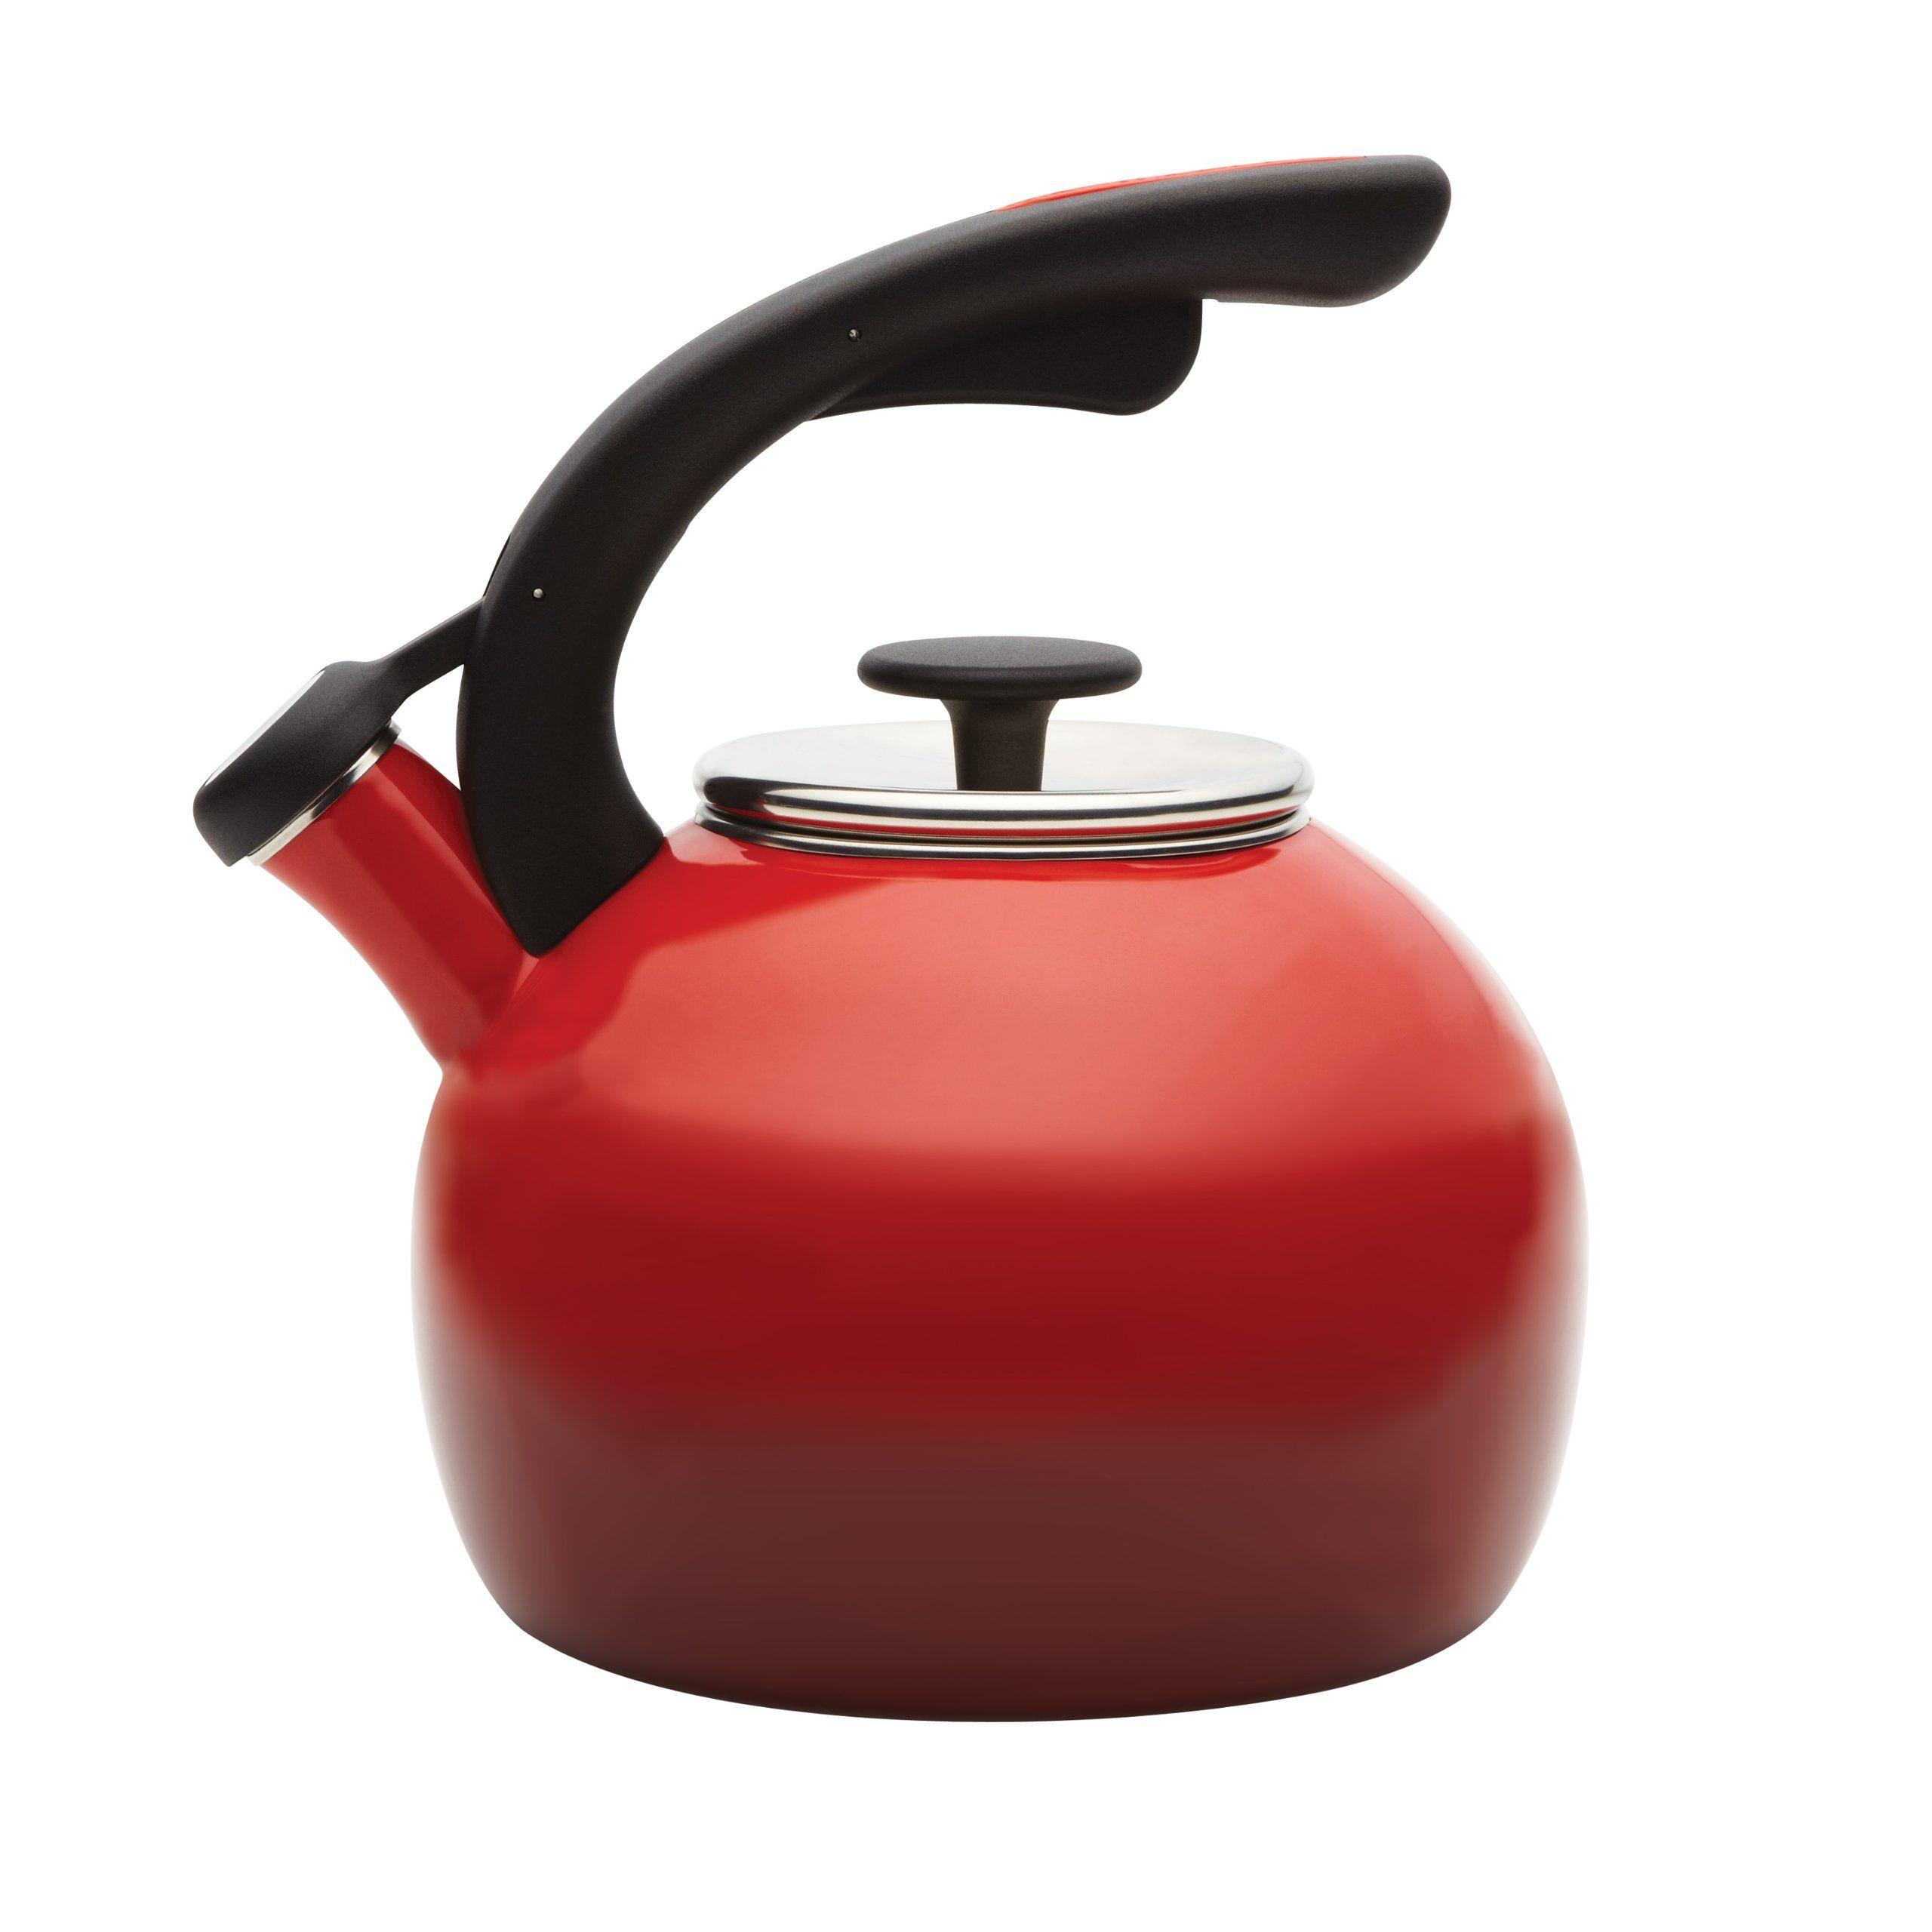 rachael ray teakettles 2 quart crescent kettle gradient red